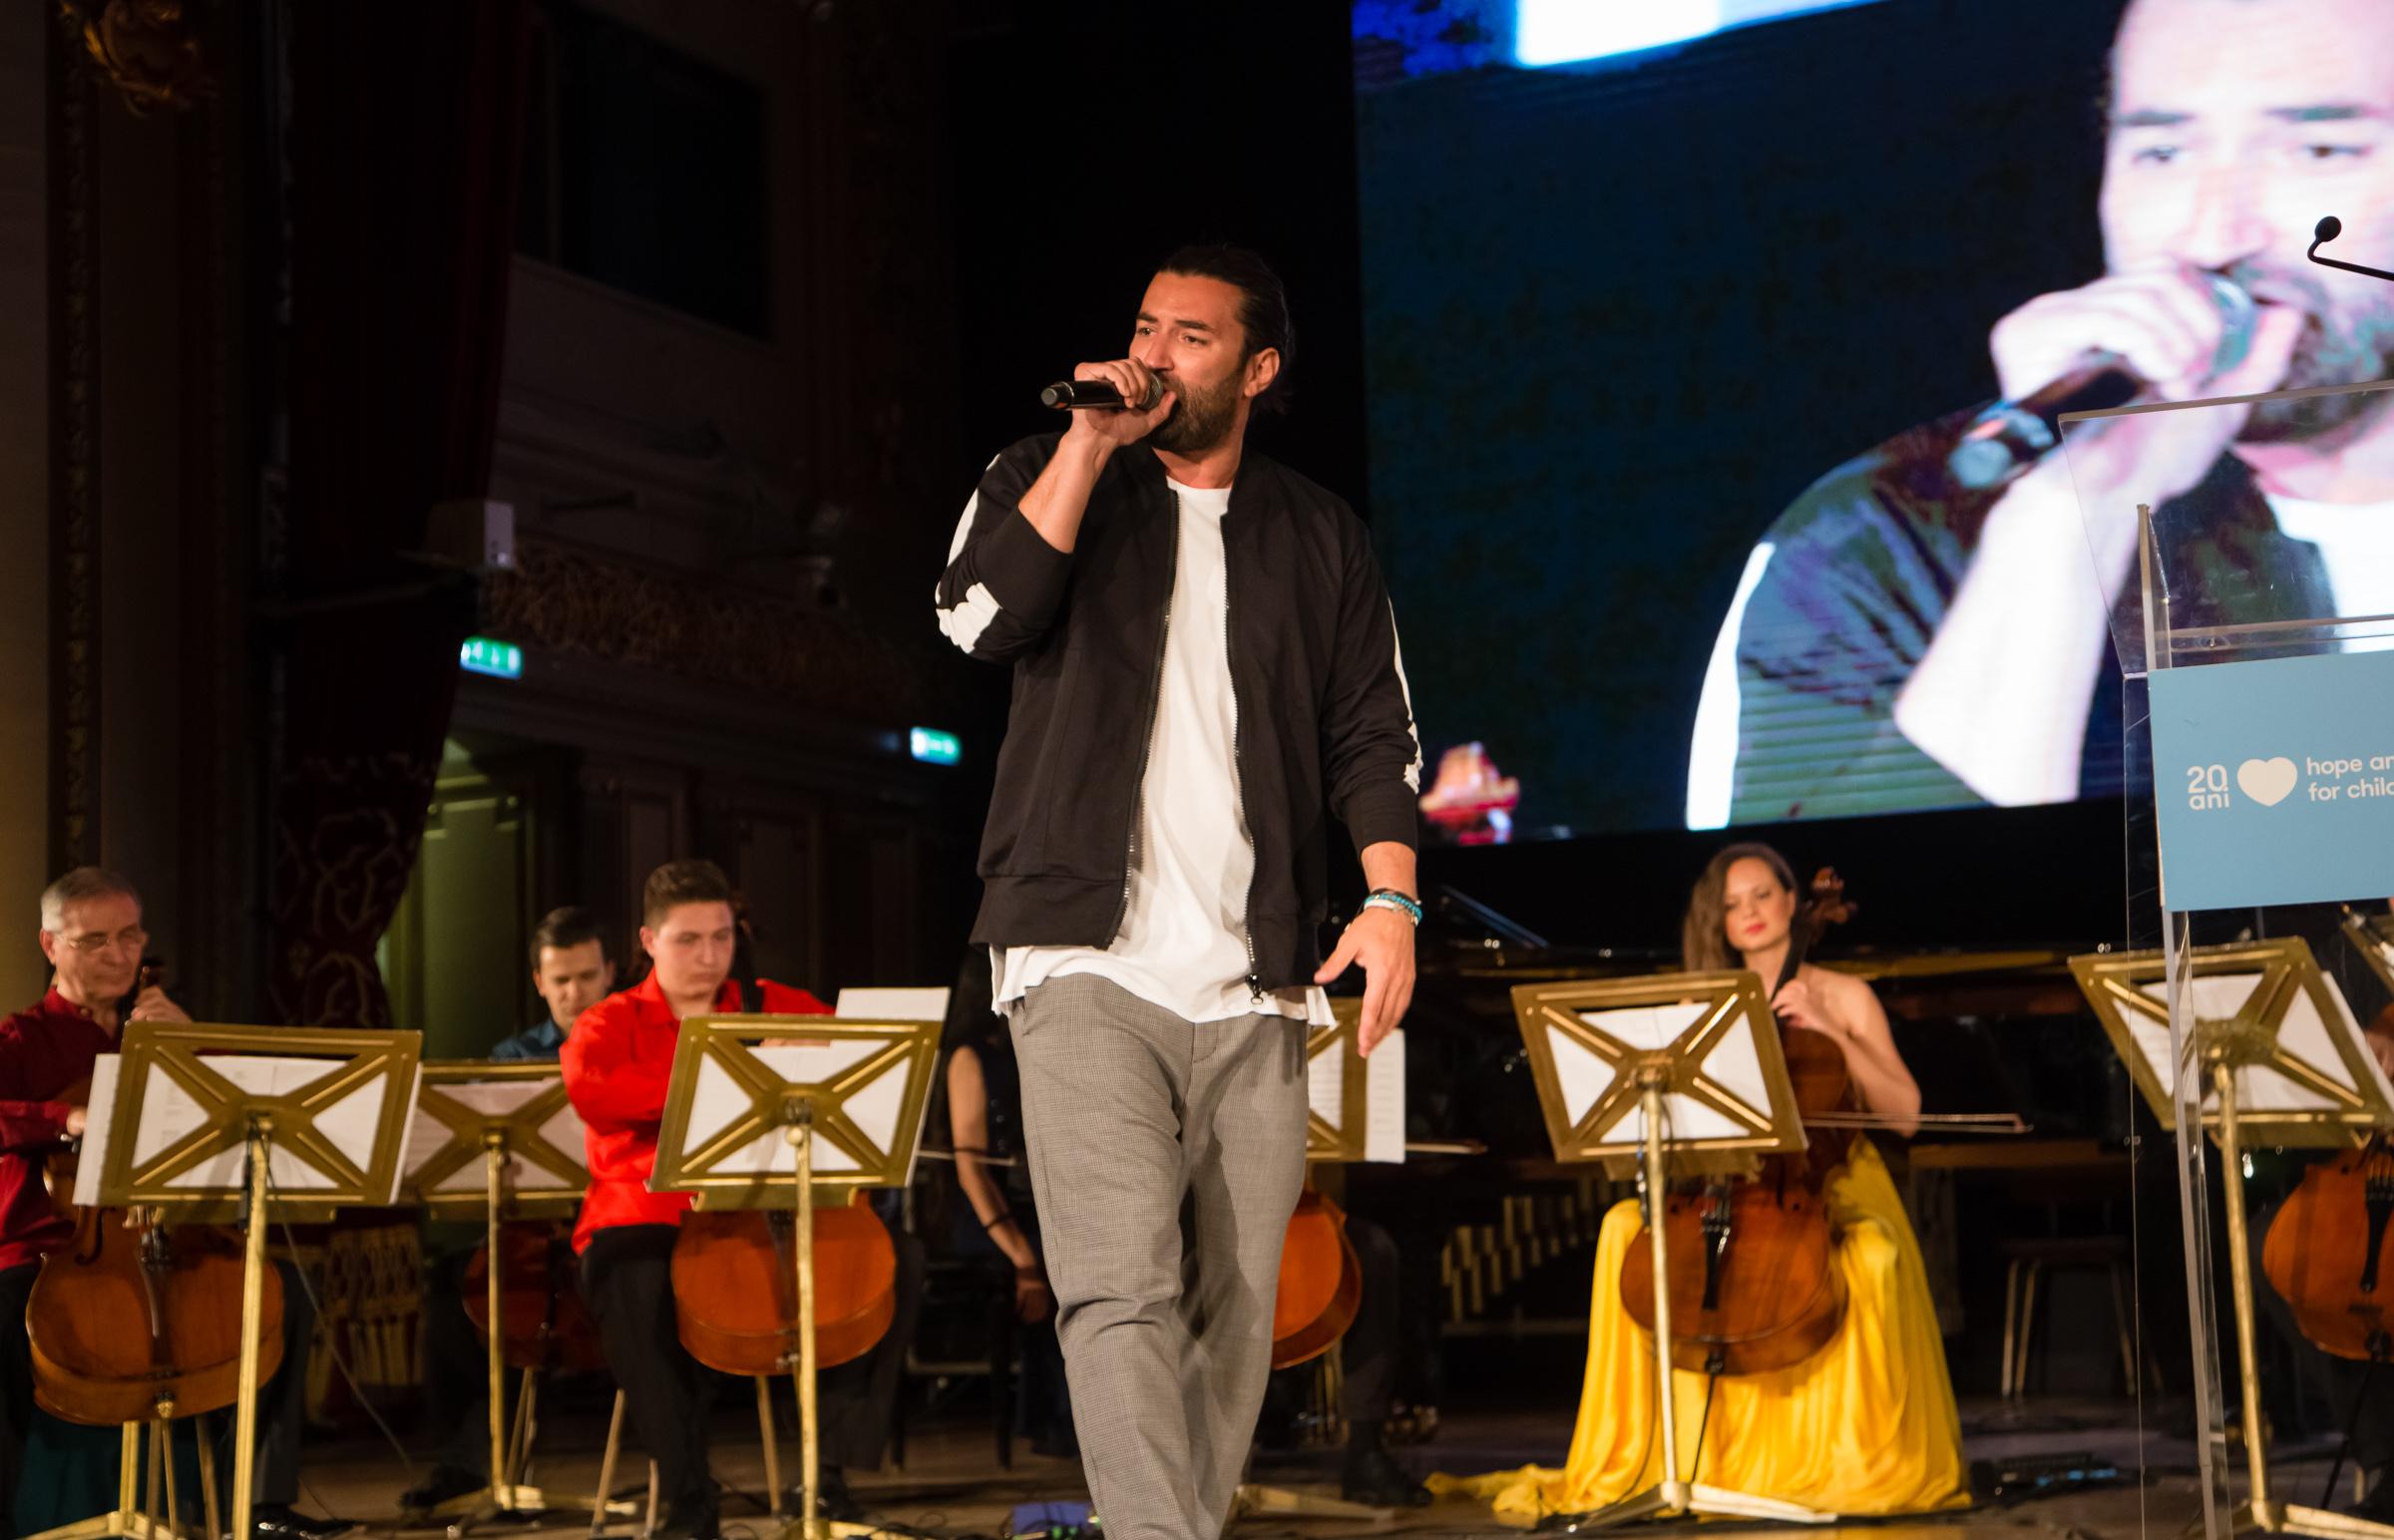 Smiley_Hope Concert 2018_02_Foto Mihnea Ciulei.jpg